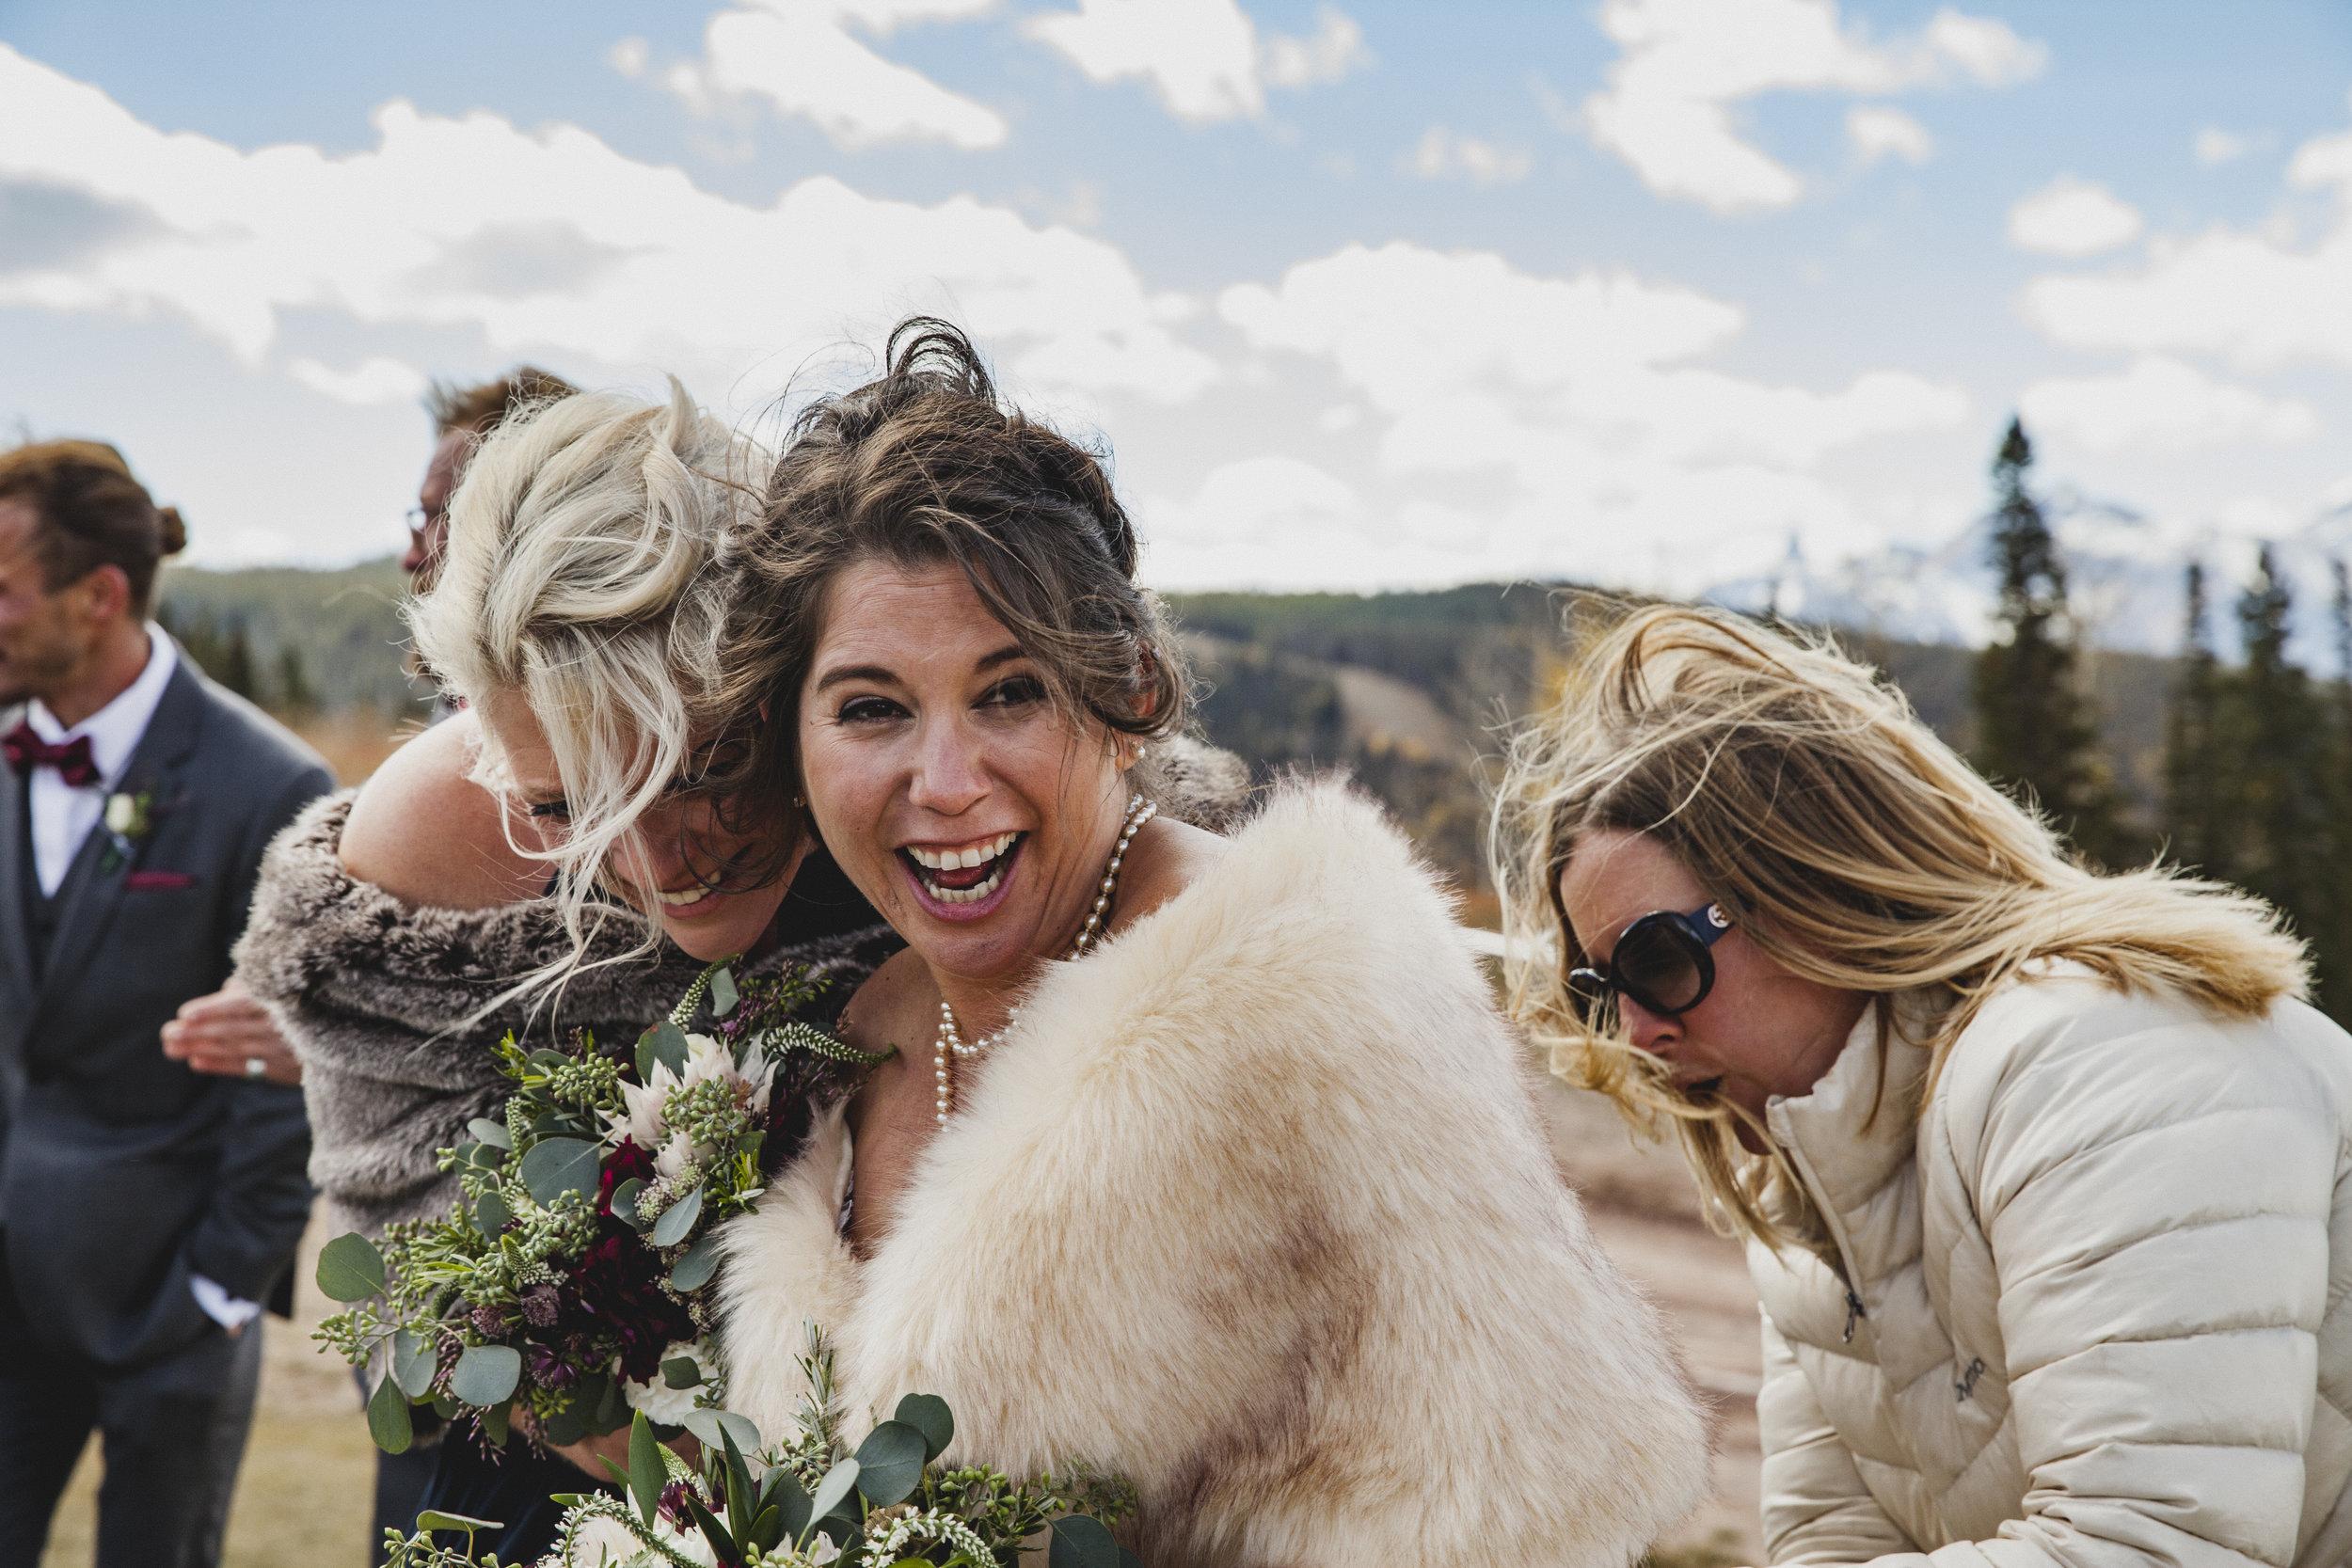 NE-LeahandAshtonphotography-Telluride-Wedding-Photography-6891.jpg